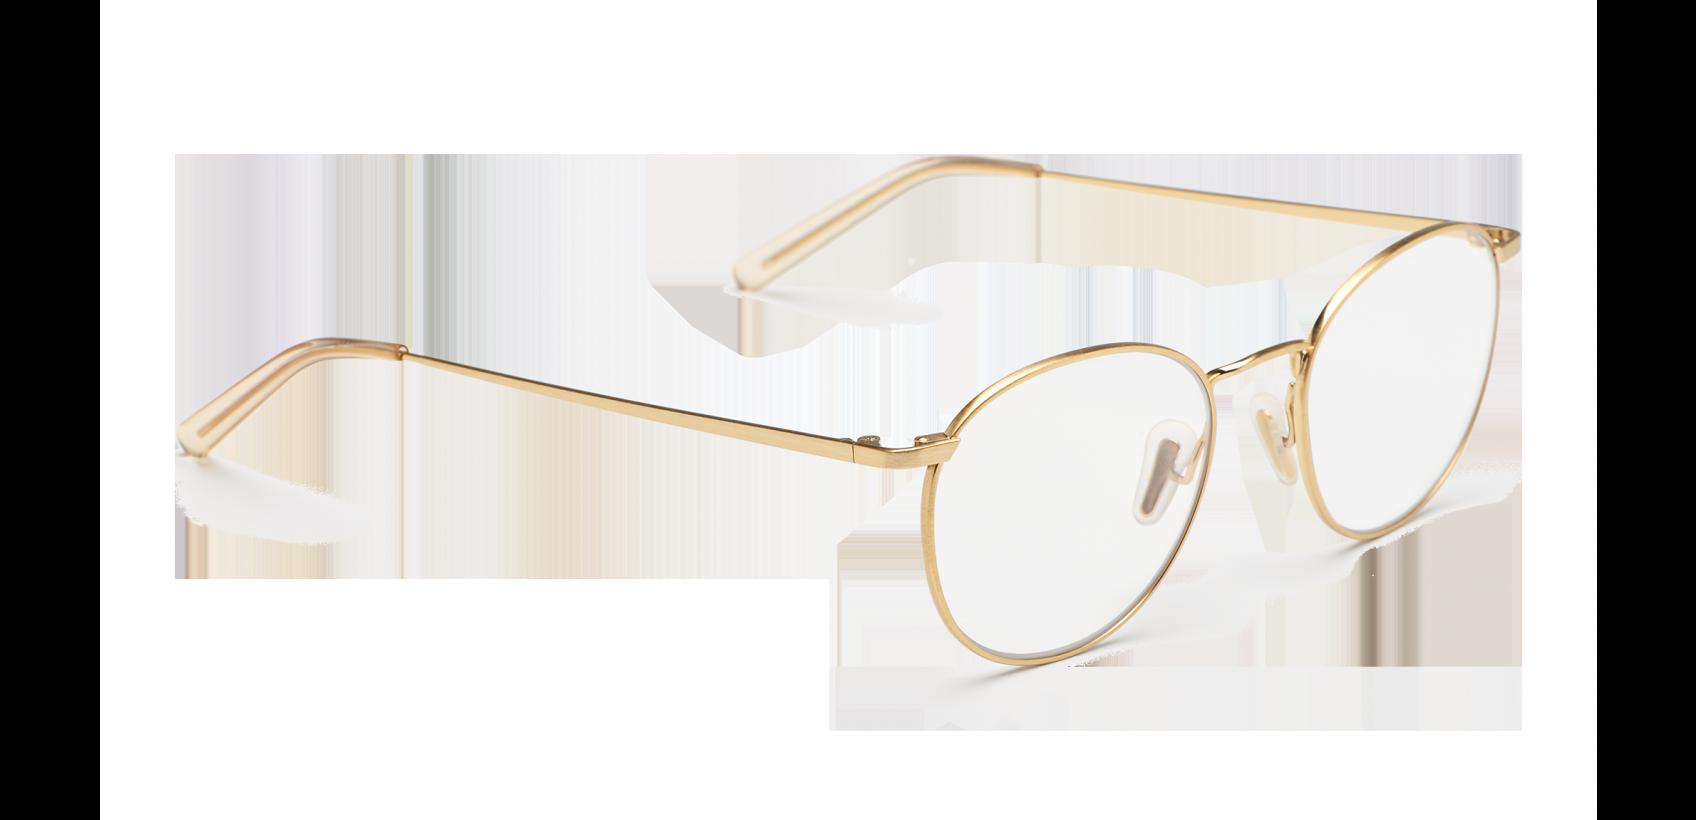 5c288d8c4c finally -  my new glasses!  3 Ace   Tate - Neil Satin Gold